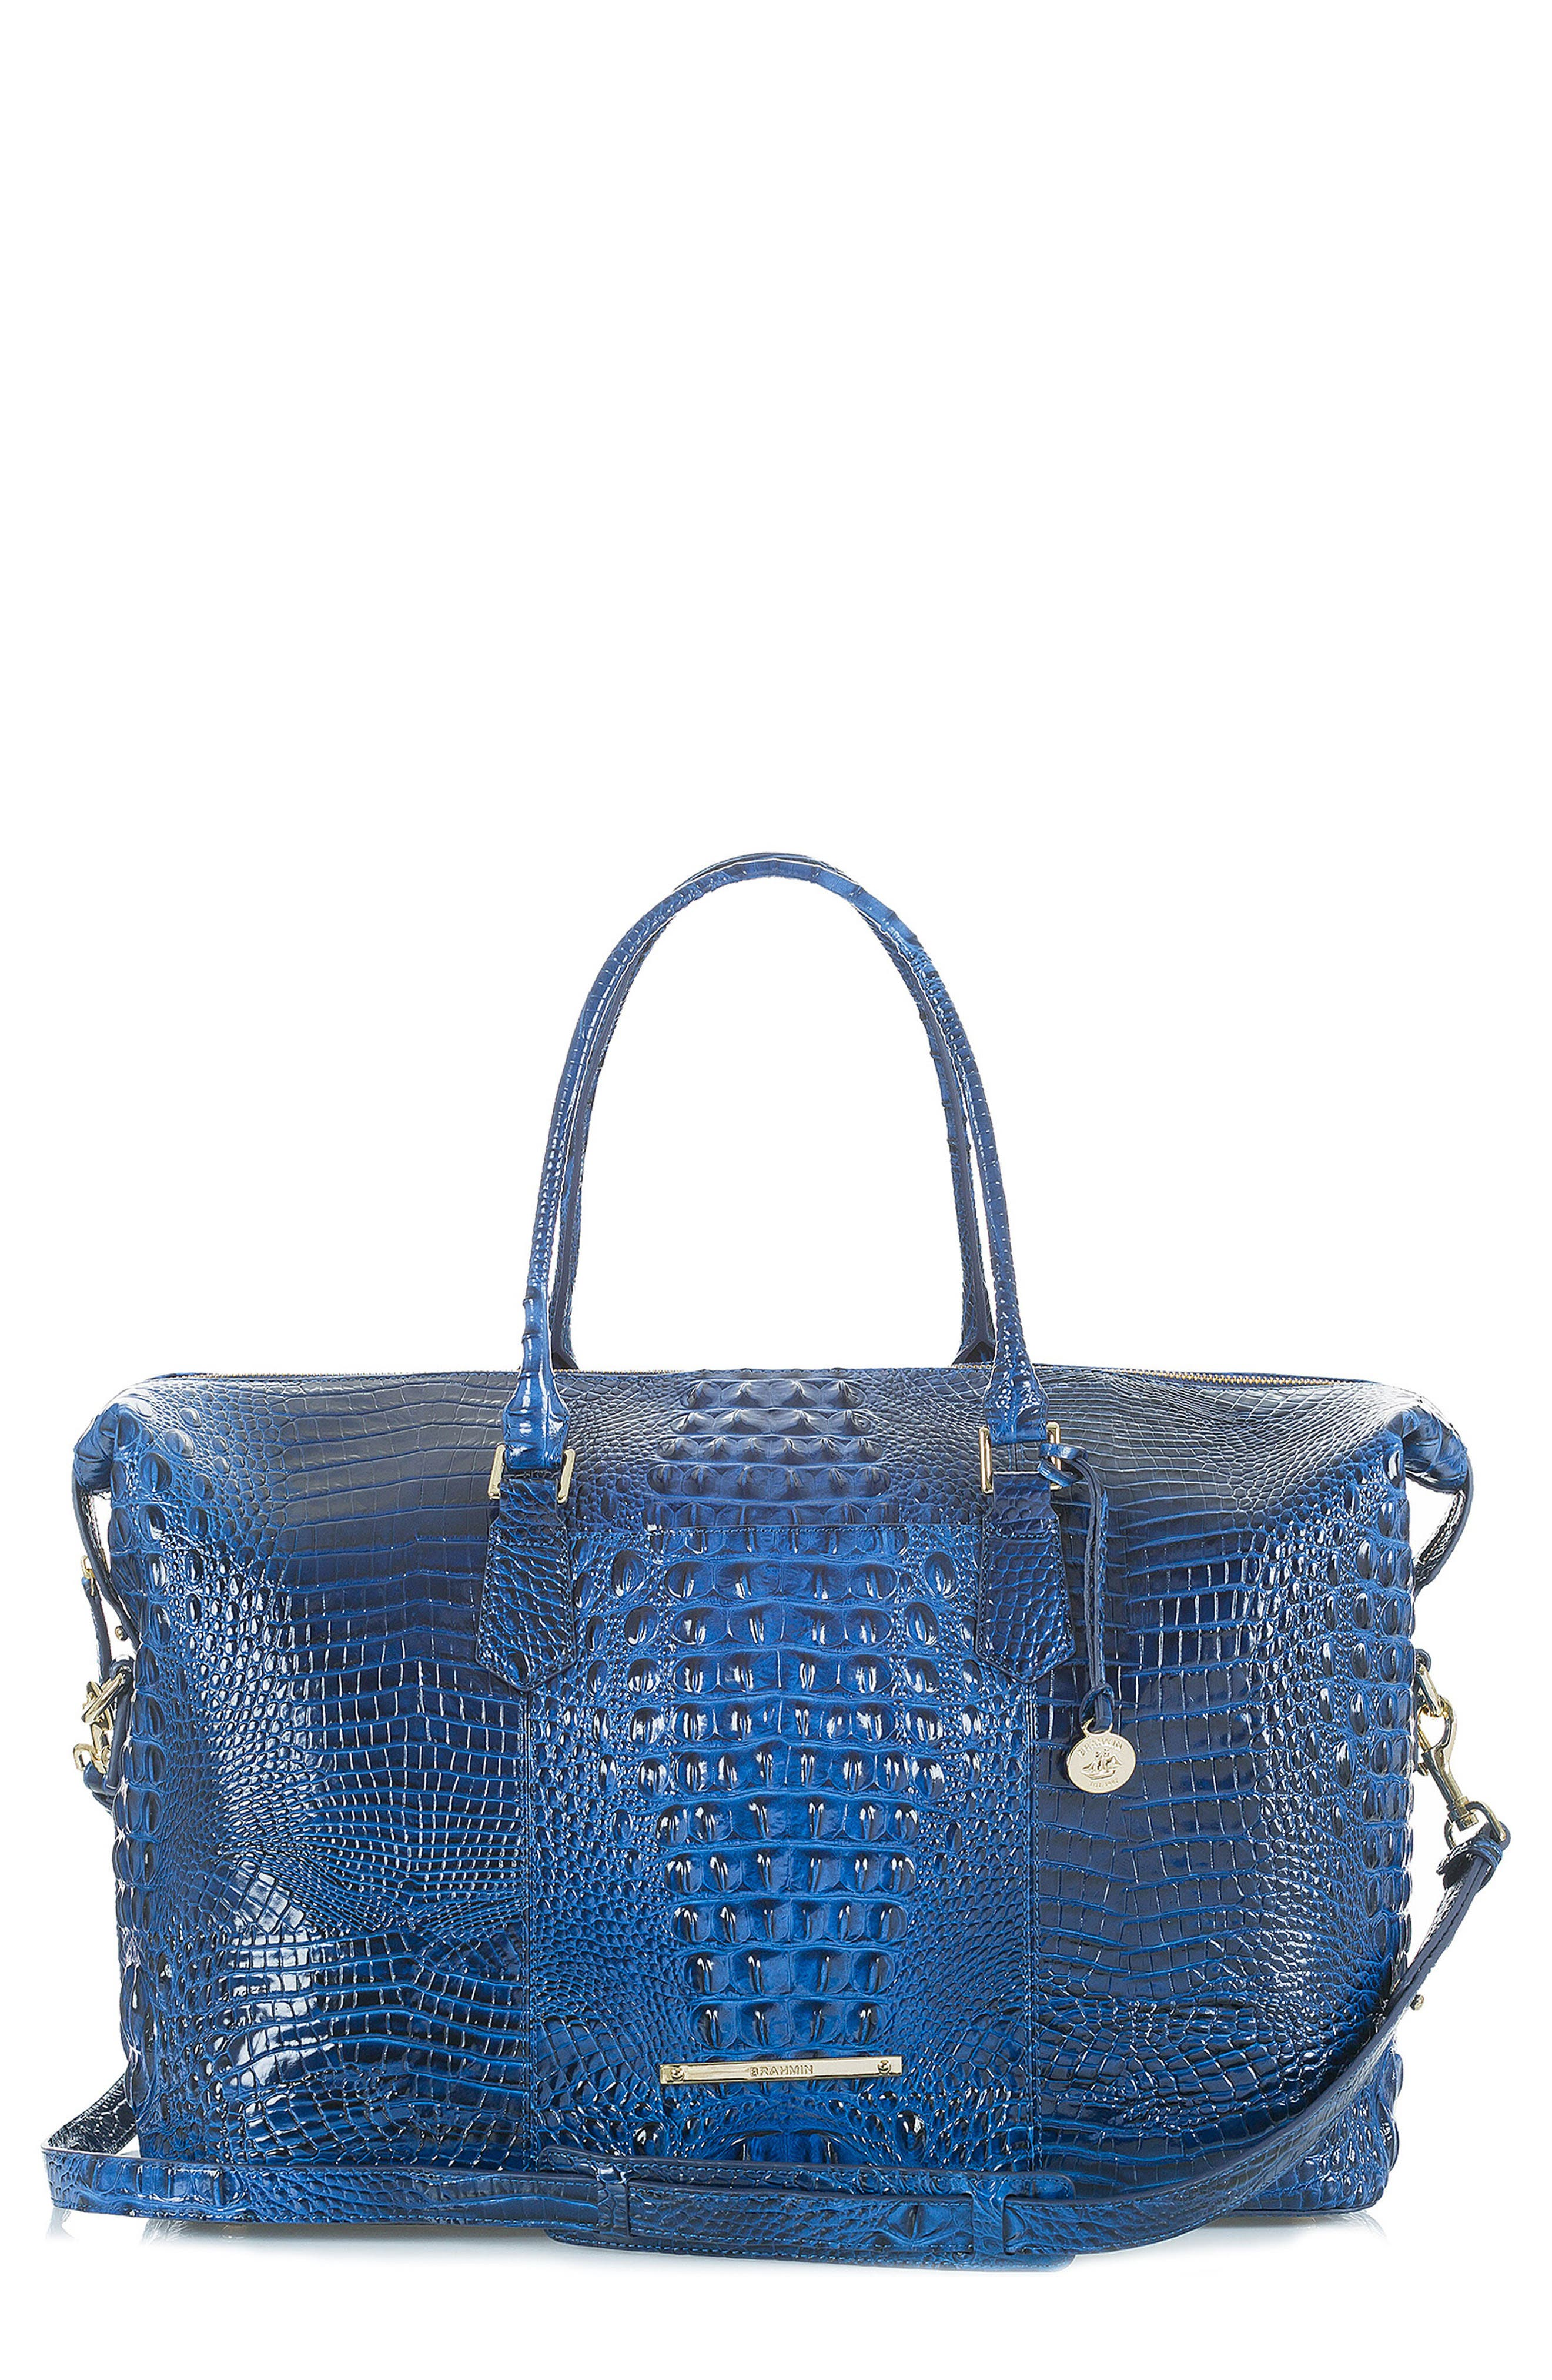 'Duxbury' Leather Travel Bag,                             Main thumbnail 2, color,